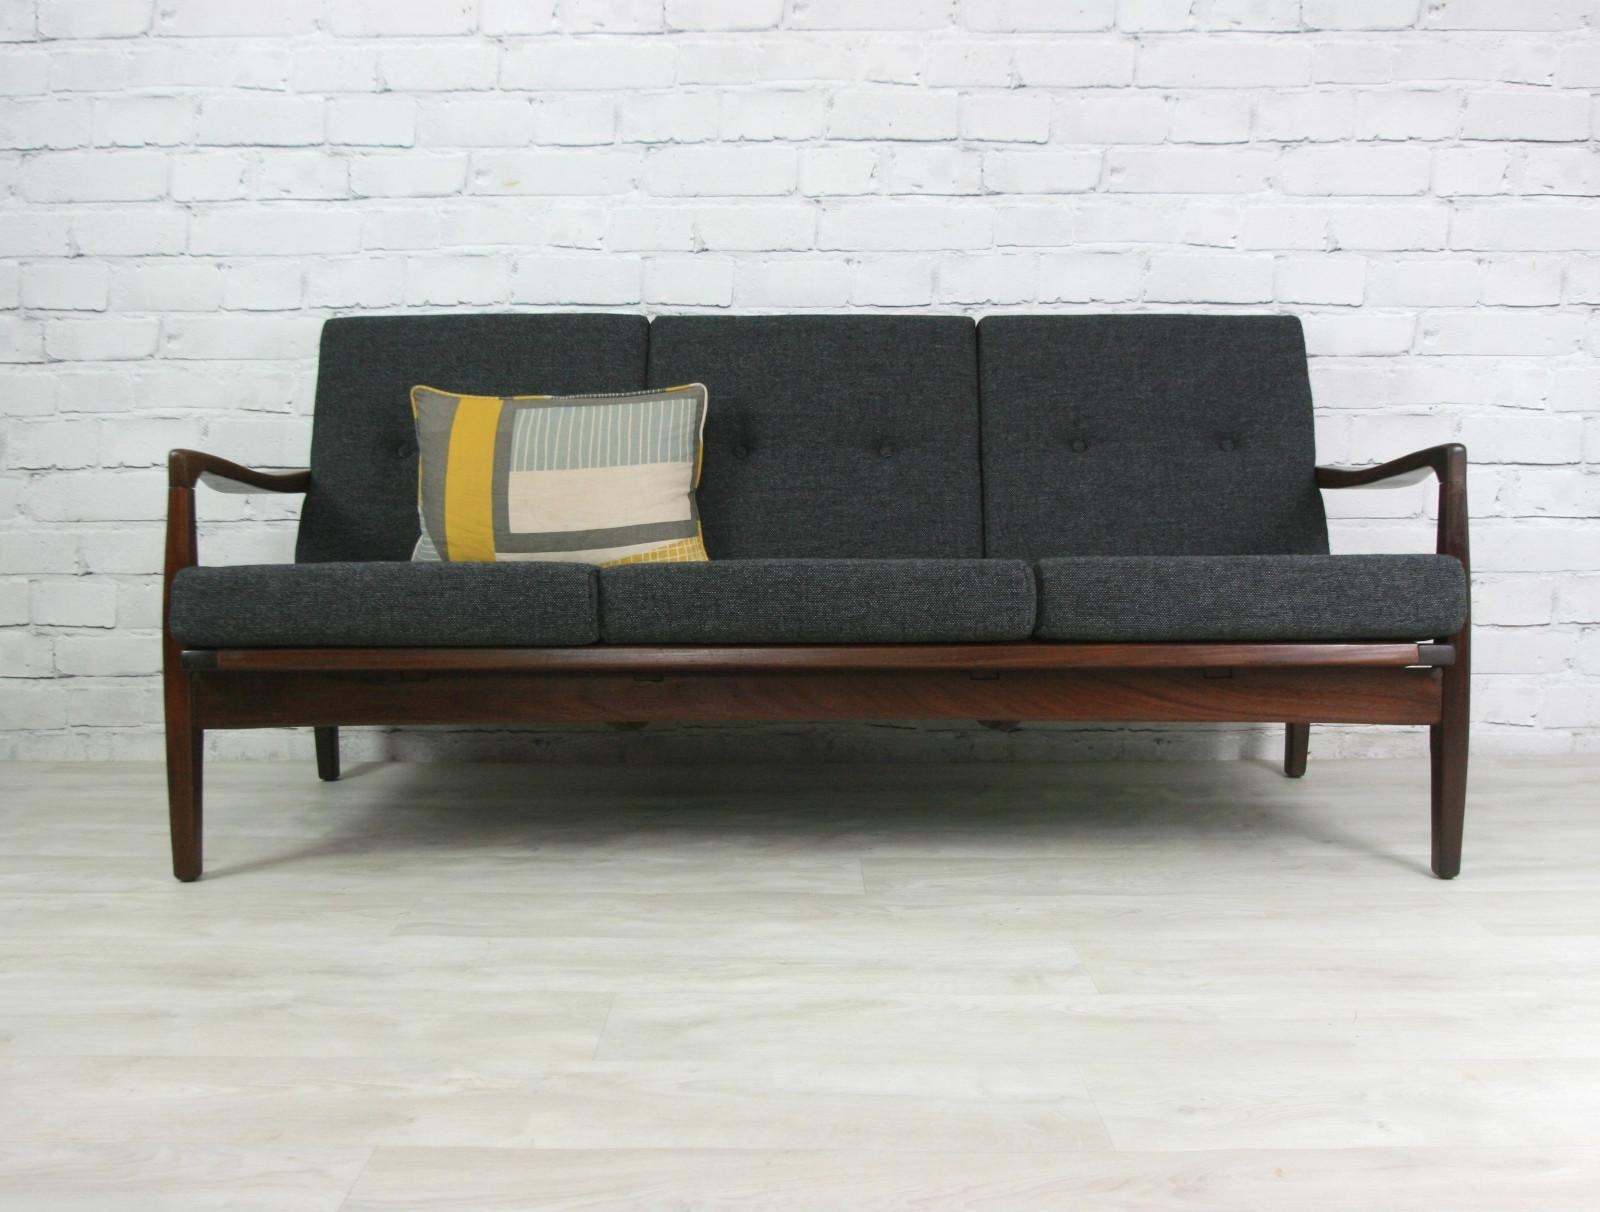 Sofas Center : 45 Remarkable Retro Sofas For Sale Picture Throughout Retro Sofas For Sale (Image 7 of 20)